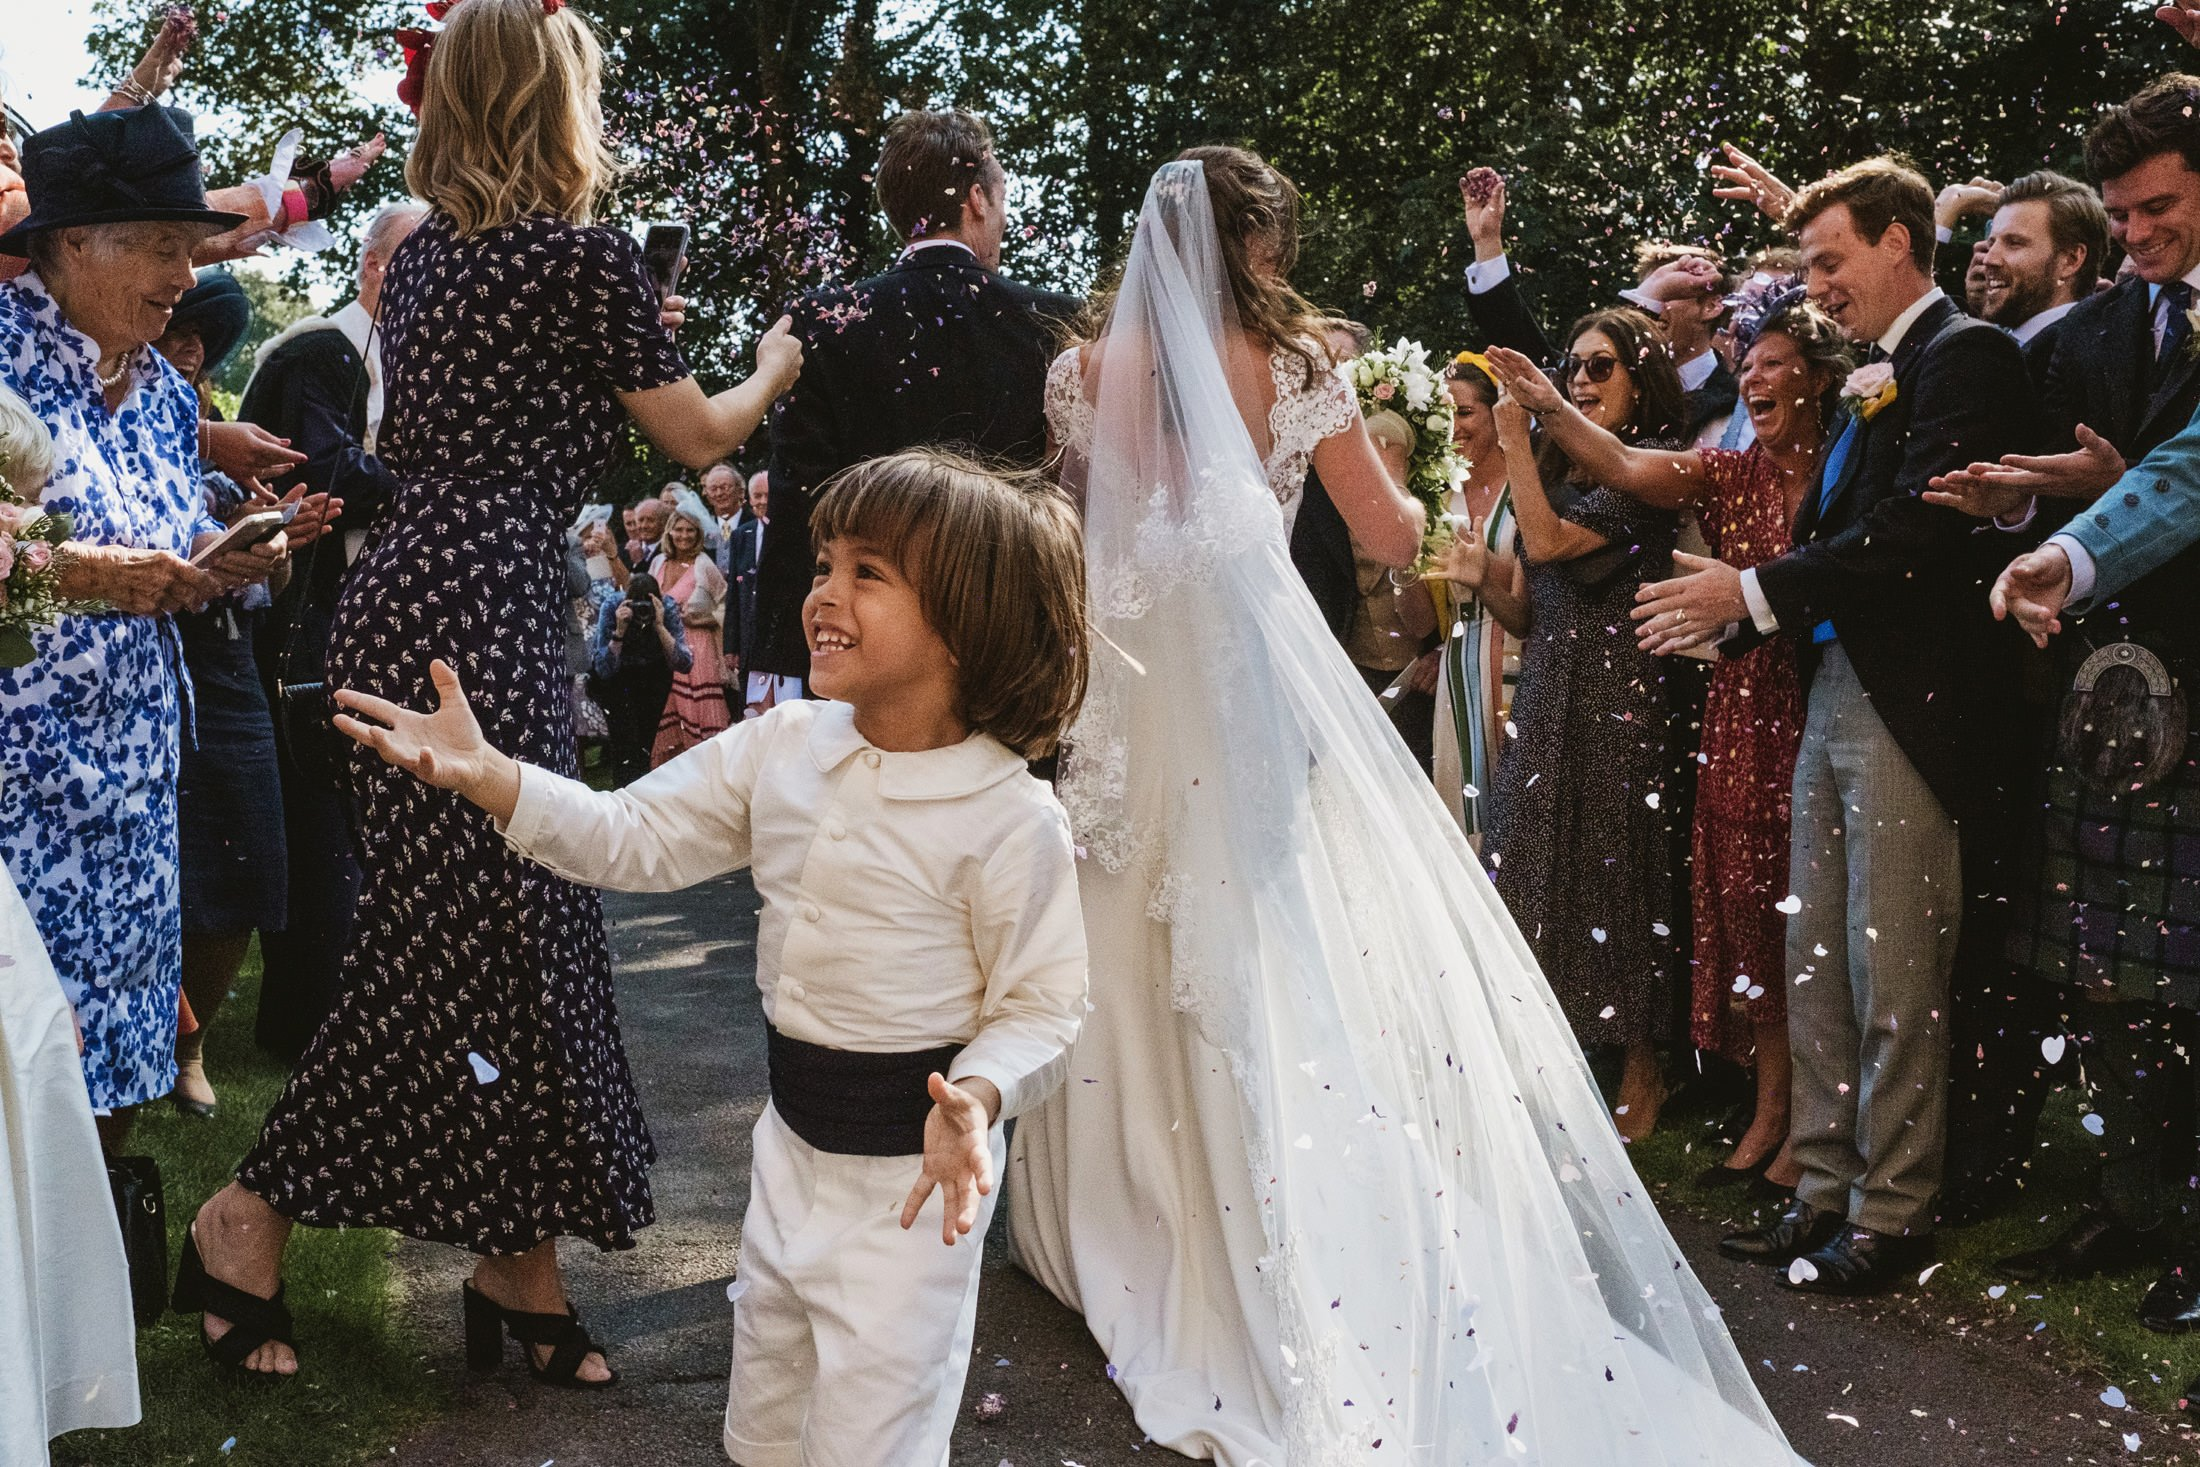 bride and groom running through confetti